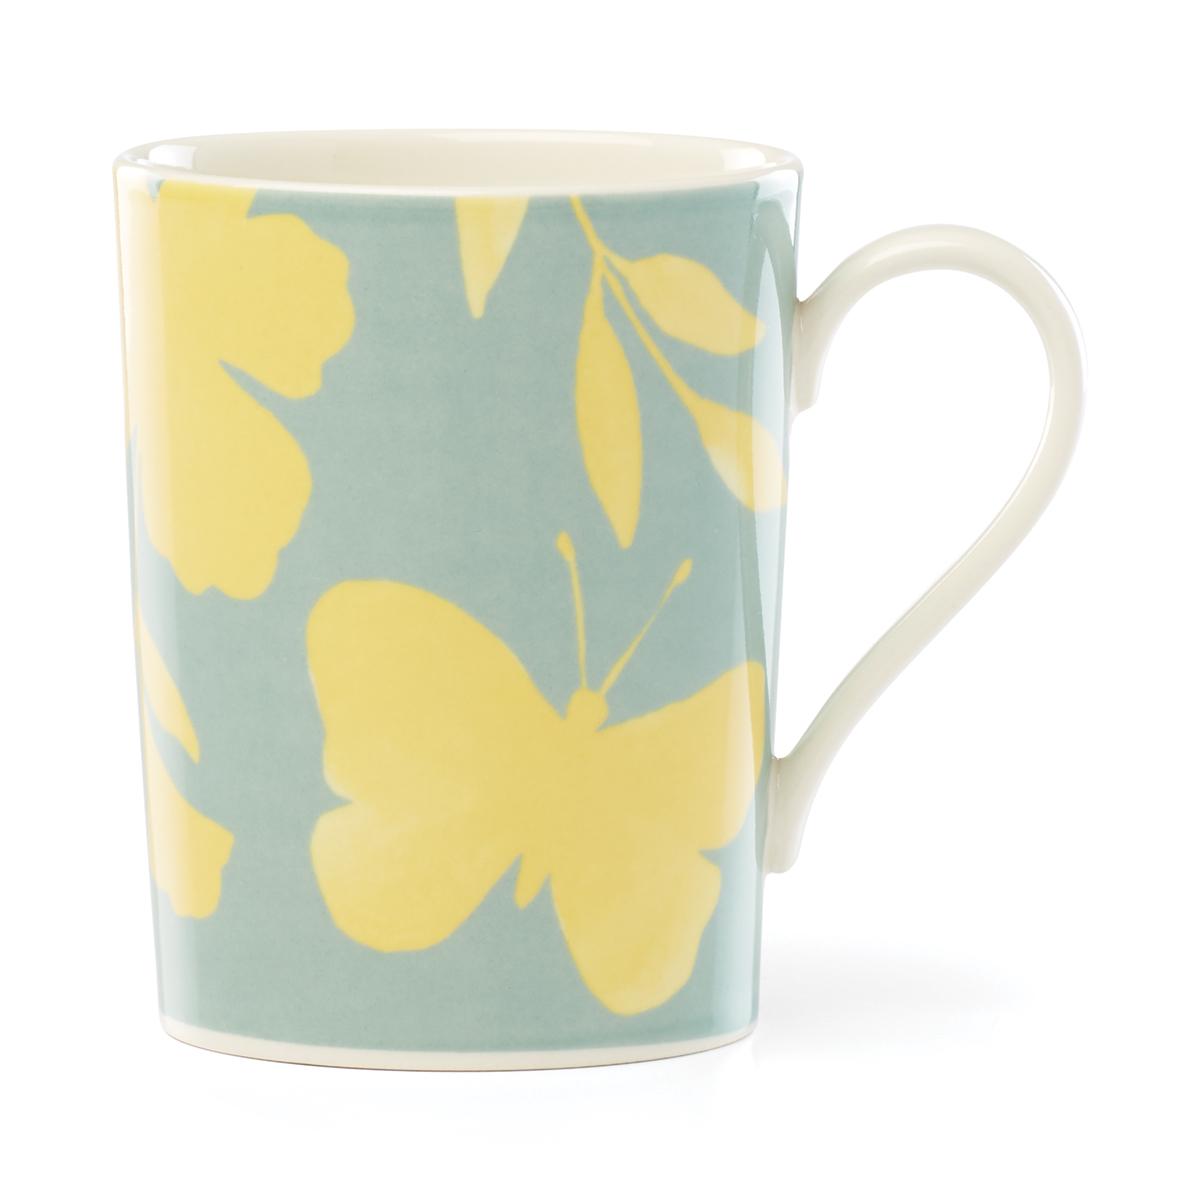 Kate Spade China by Lenox, Petal Ln Floral Mug Yellow Flower